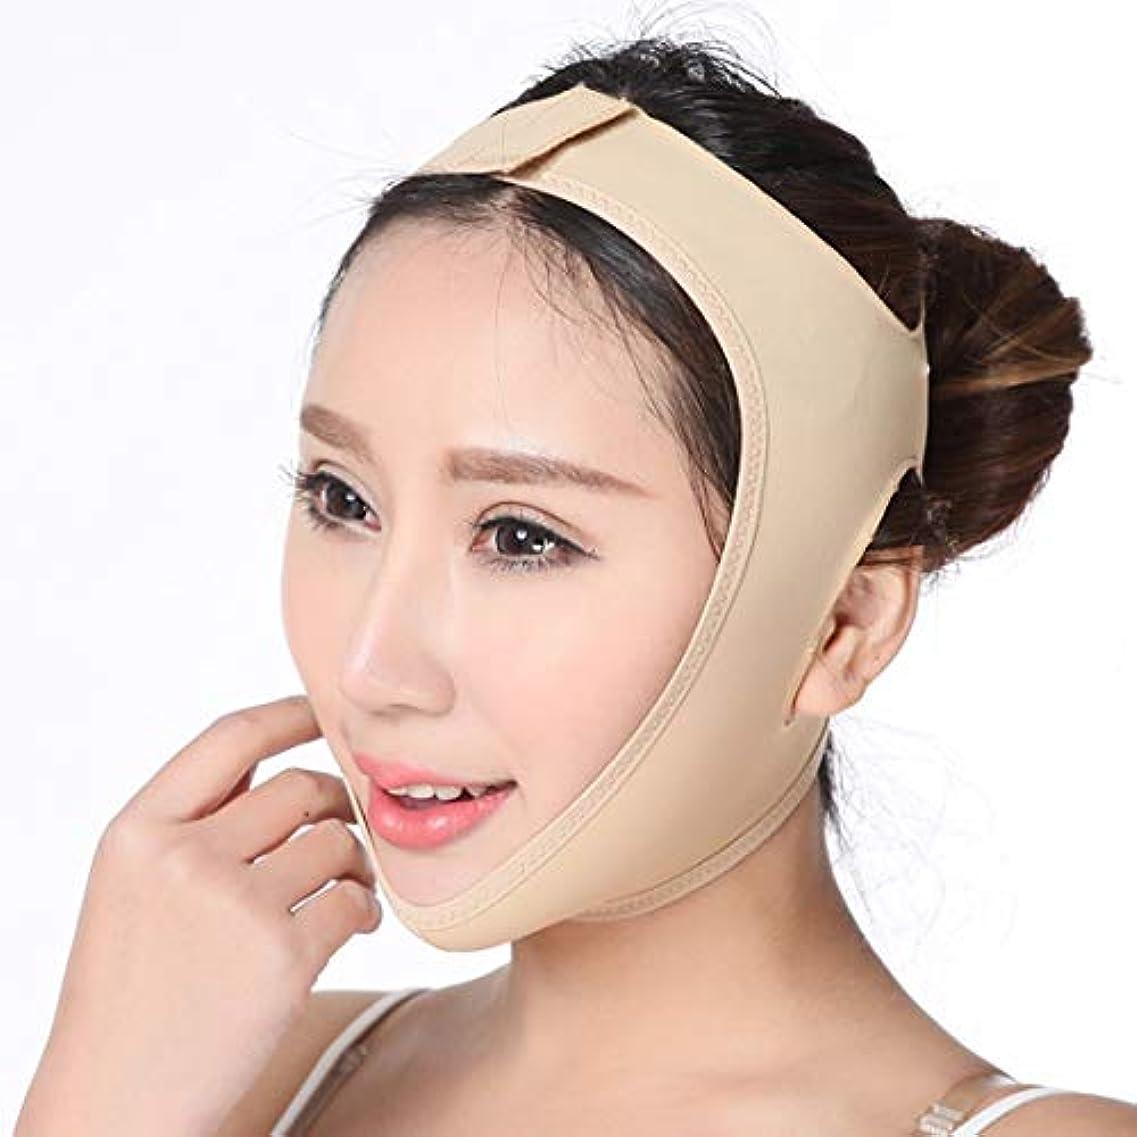 ZWBD フェイスマスク, 薄い顔包帯ネット薄い二重あご包帯小V顔睡眠メロン顔持ち上がるタイト整形マスク